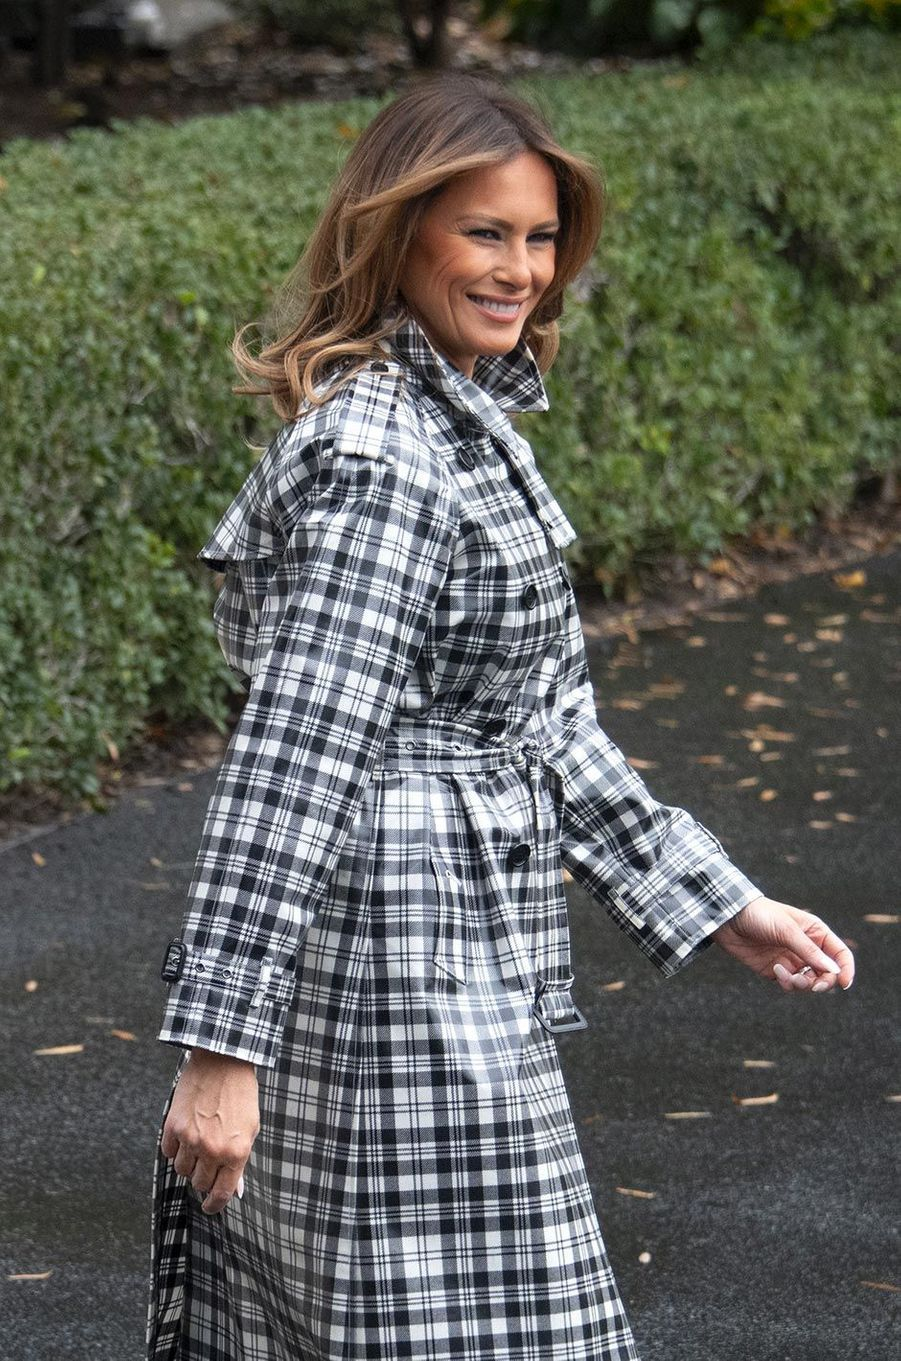 Melania Trump quittant la Maison-Blanche, le 9 novembre 2018.